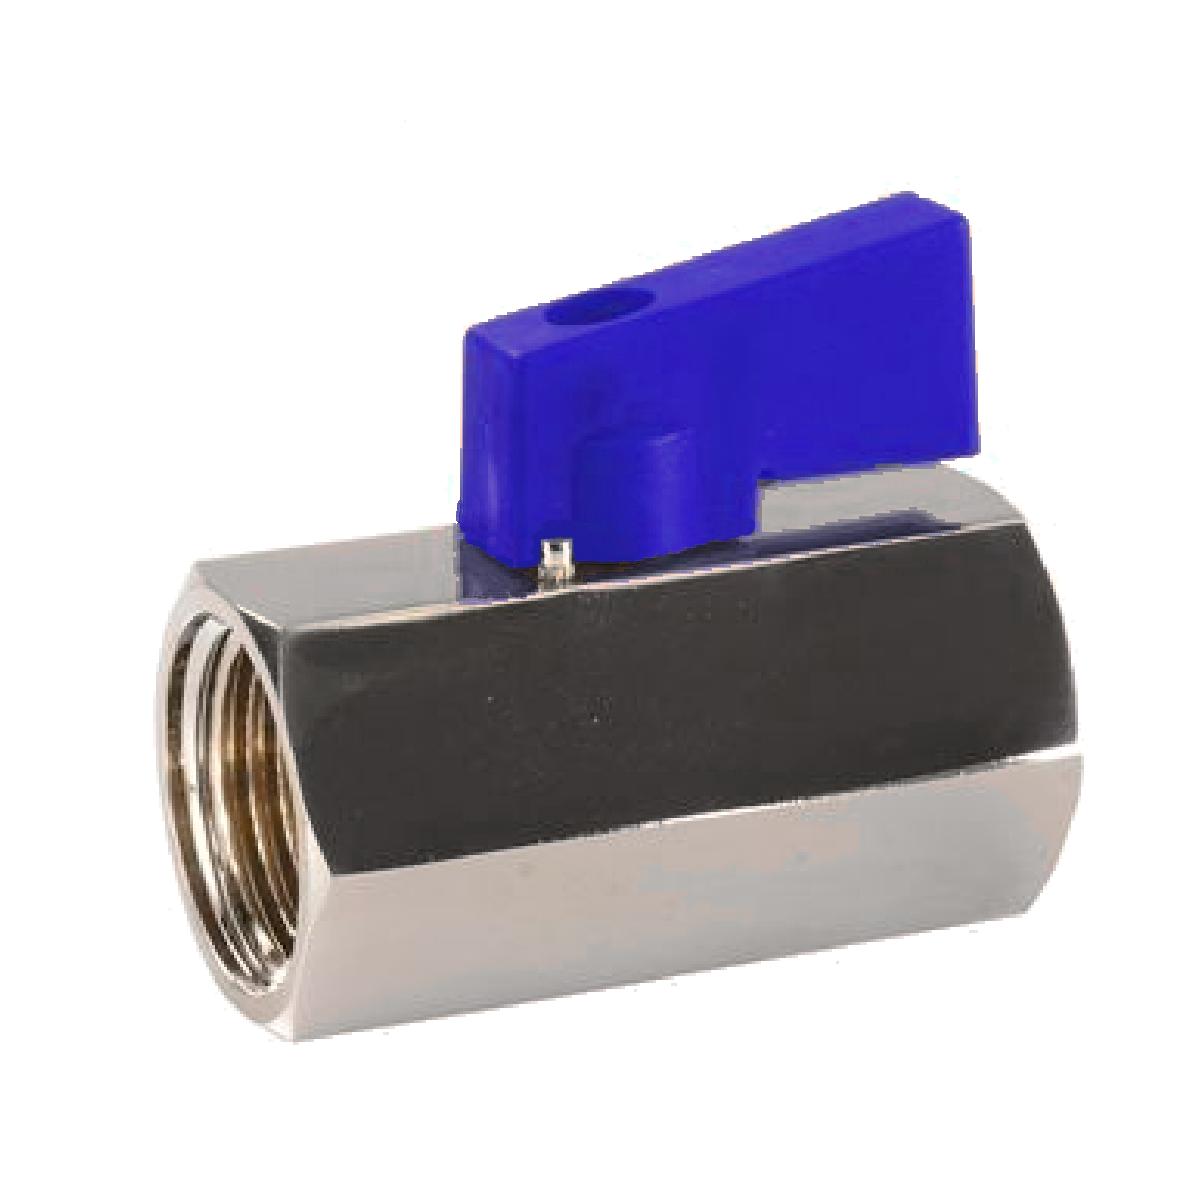 miniválvula de bola en acero con presión nominal de 16 bar